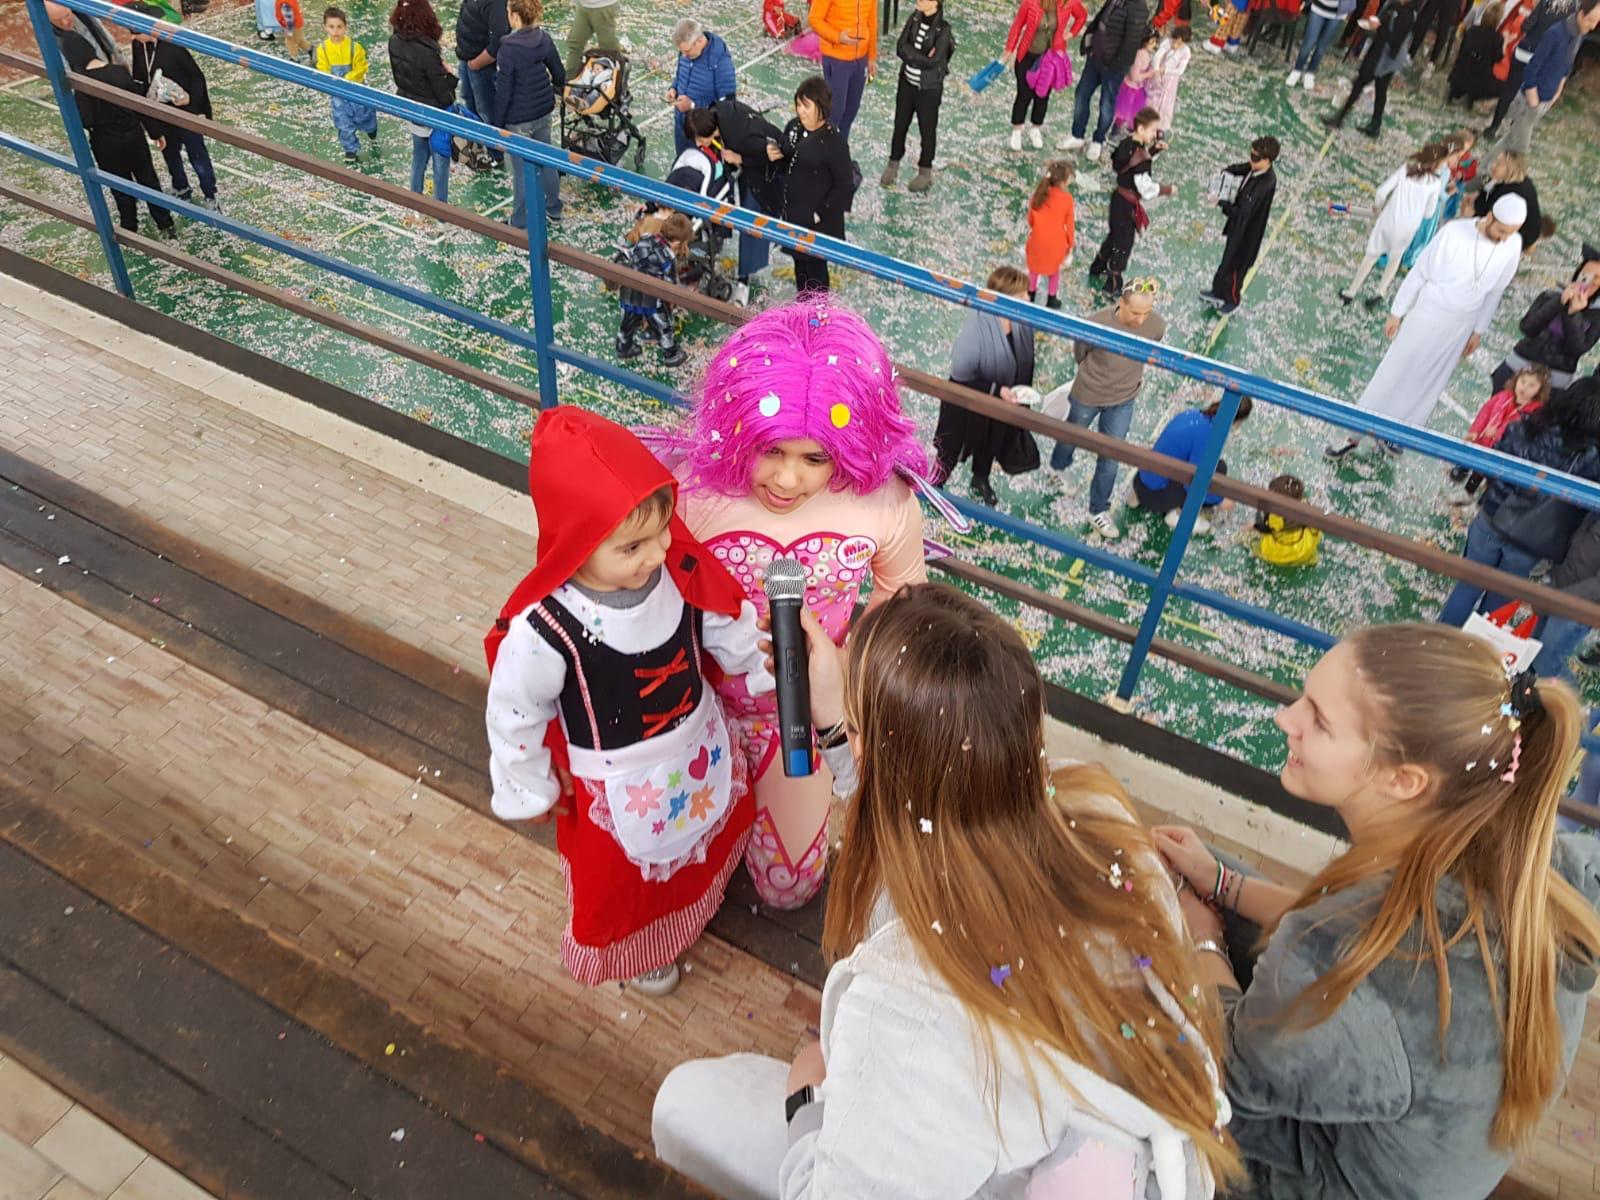 Baraonda Carnevale 2019 (27)